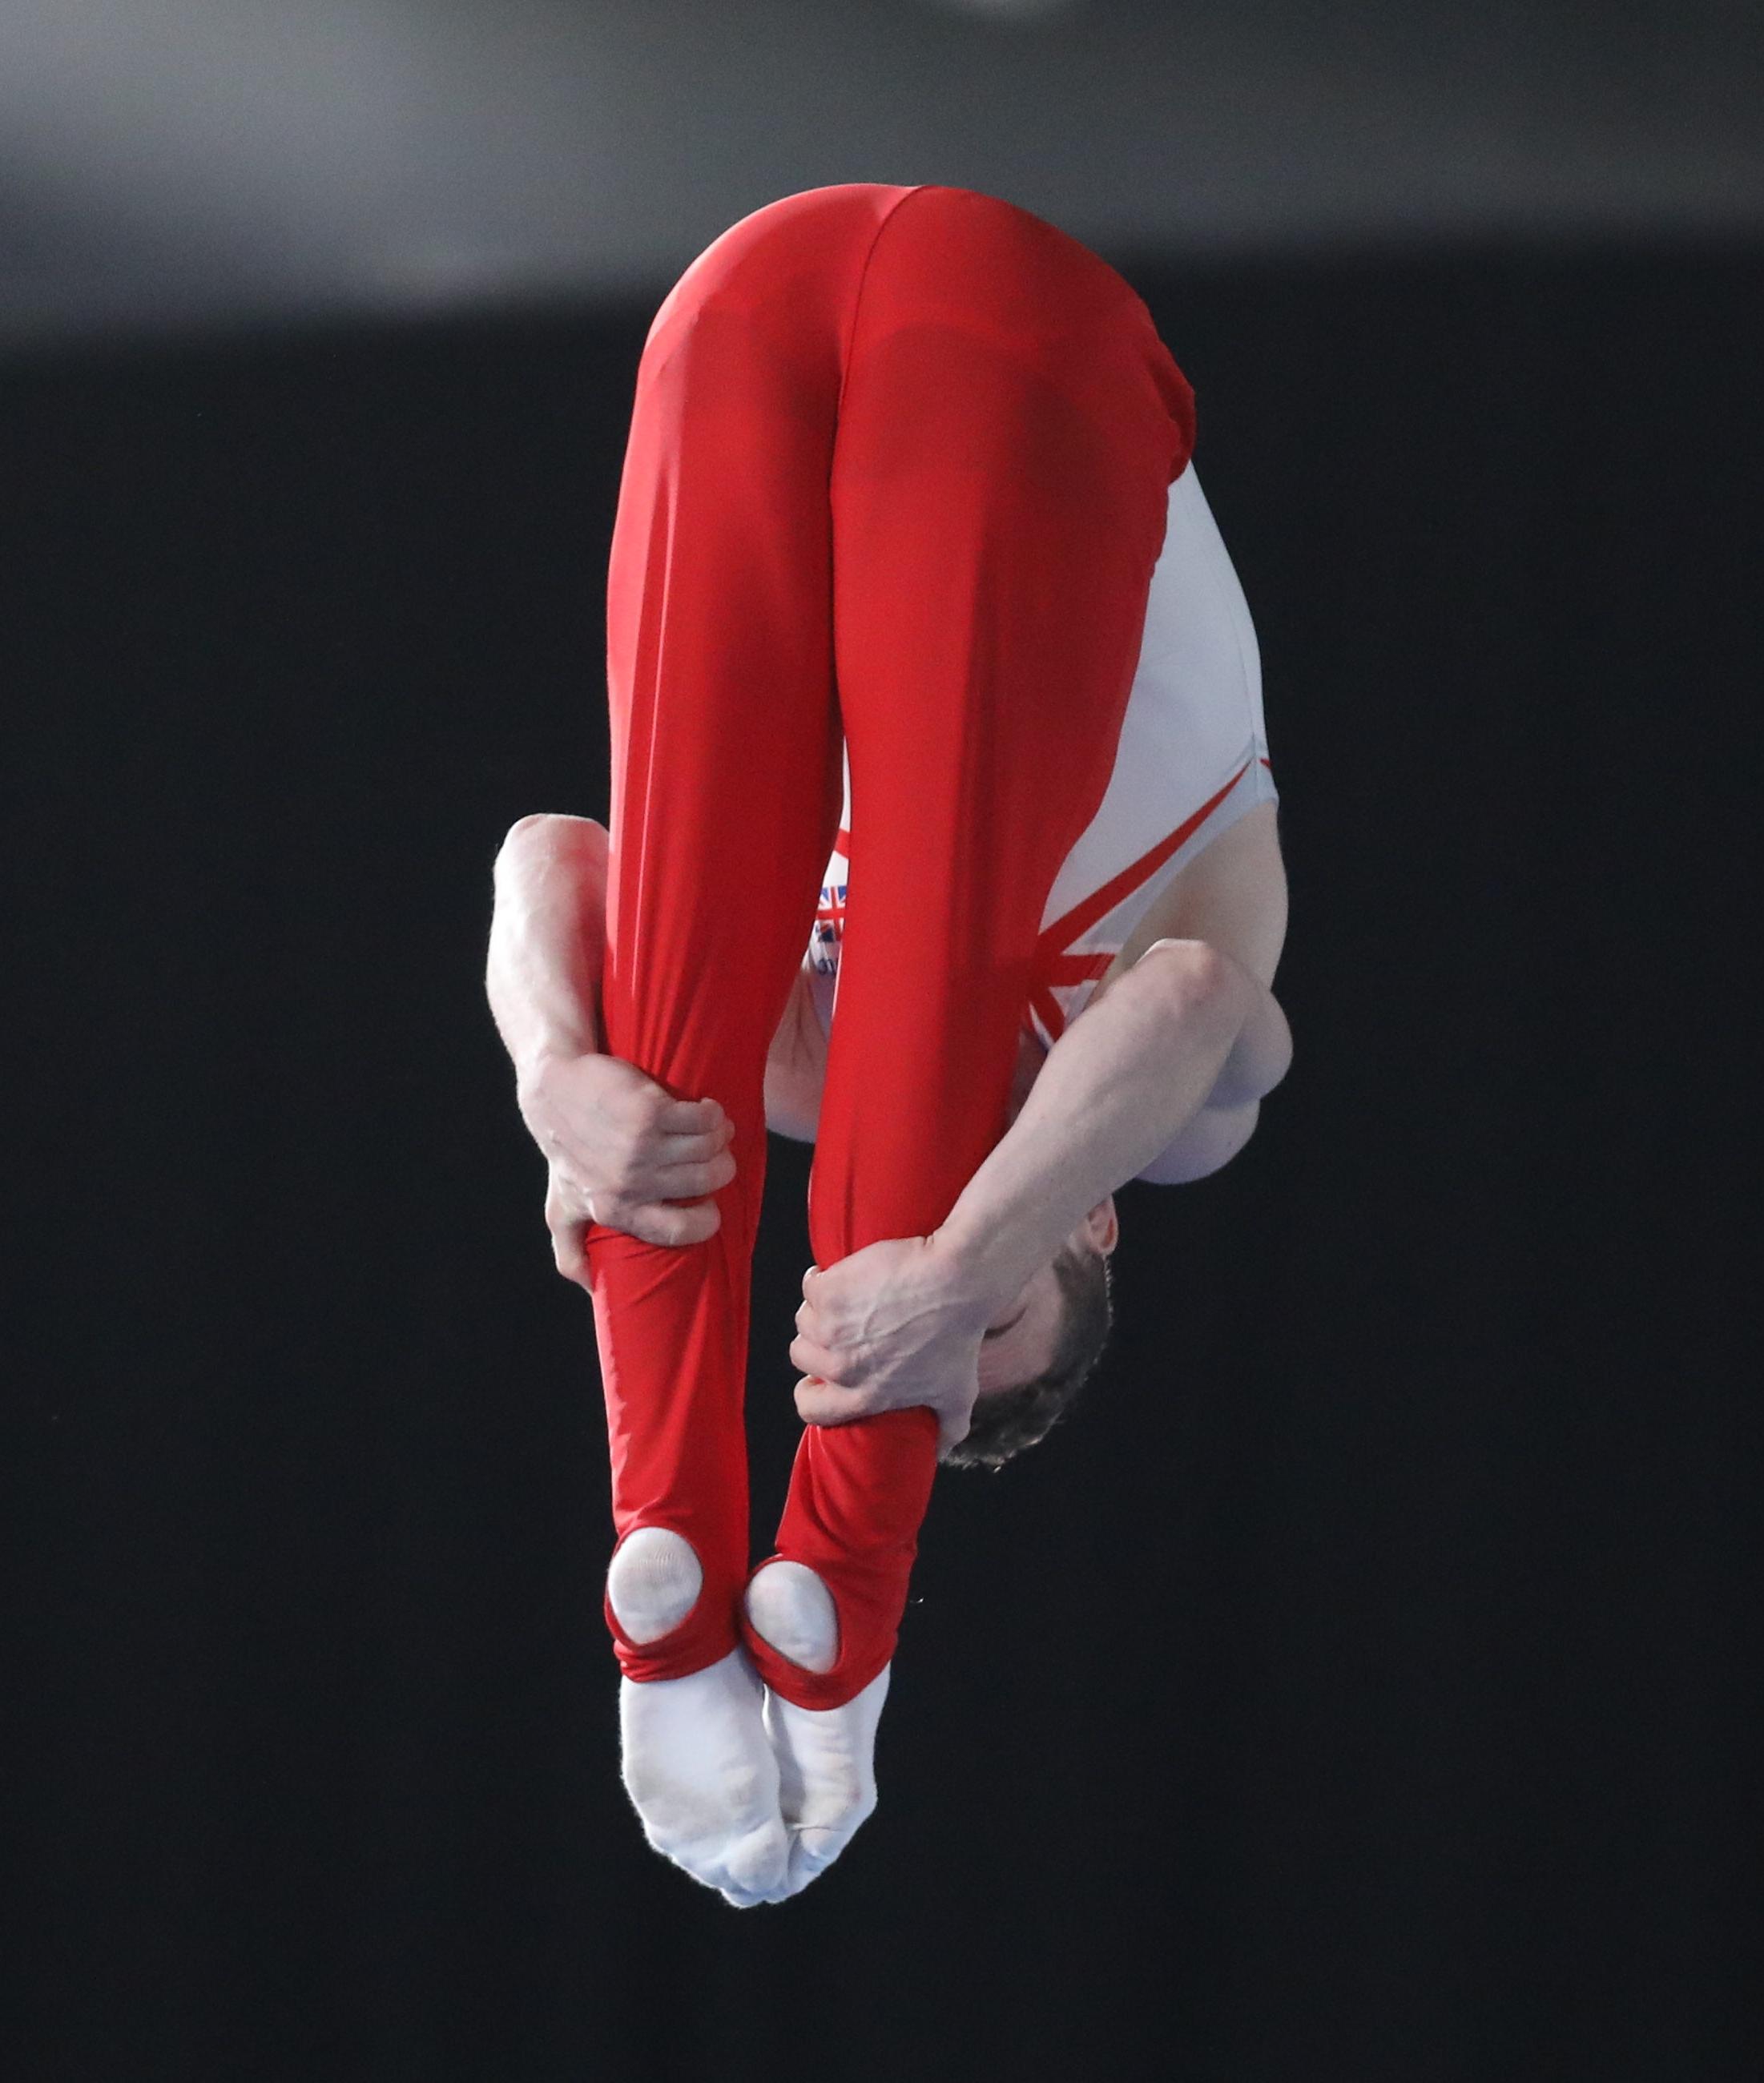 2018-10-14 Boys' Trampoline Gymnastics Final at 2018 Summer Youth Olympics by Sandro Halank-076.jpg Deutsch: Trampolinturnen männlich: Finale